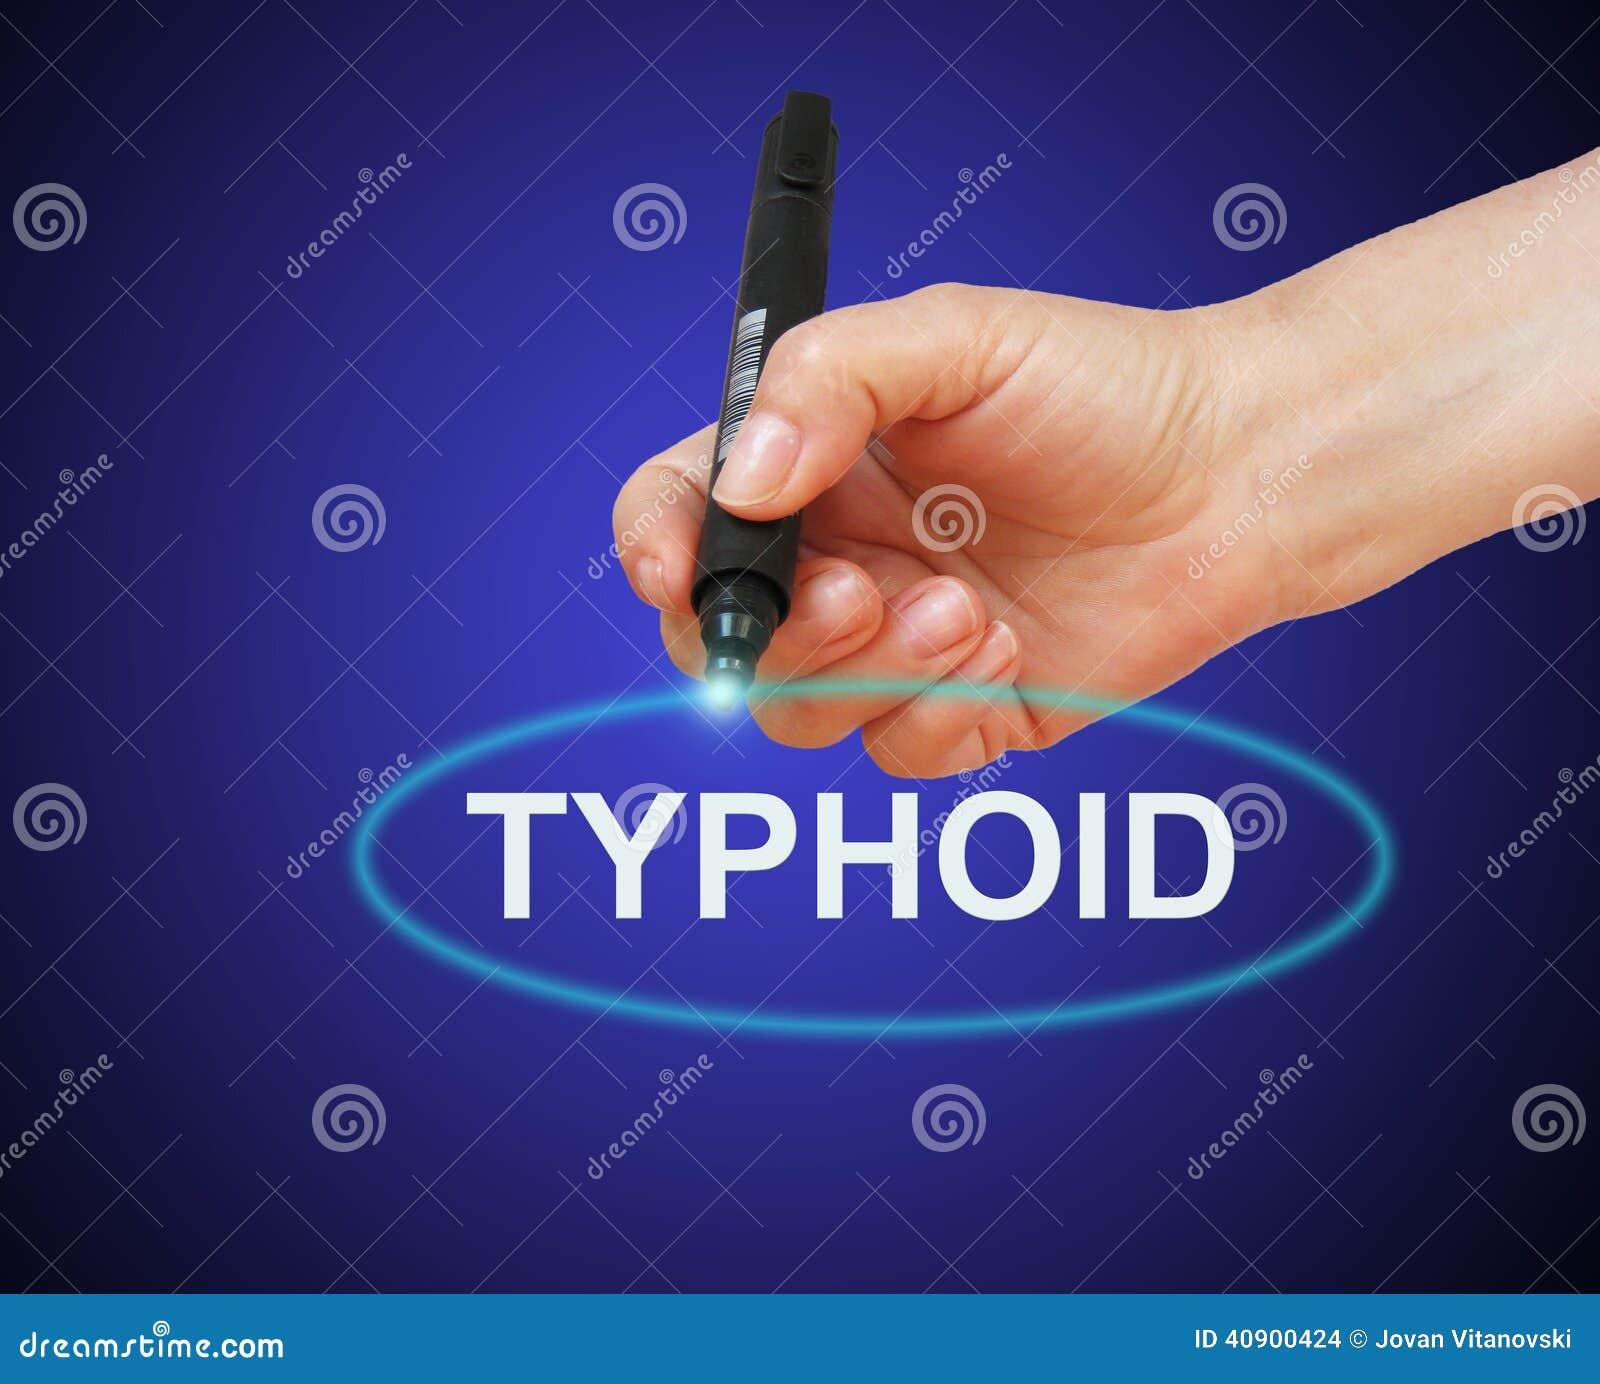 Typhusartig